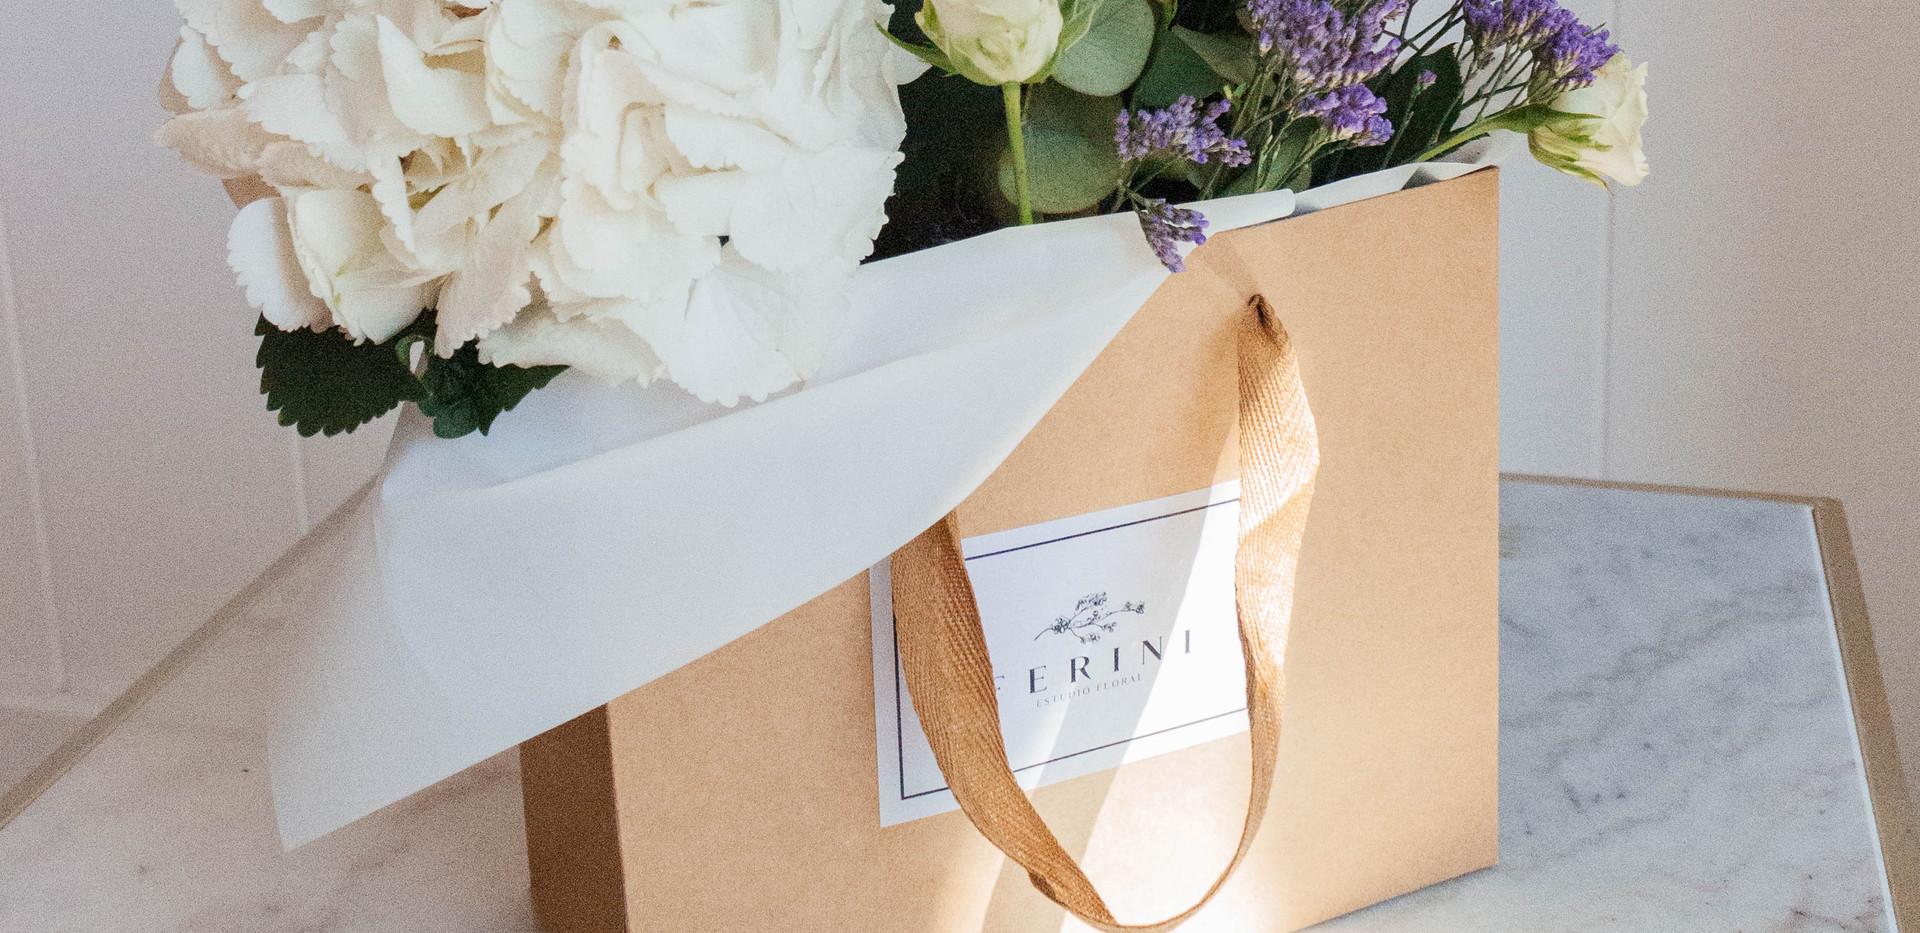 Flor en bolsa Avril